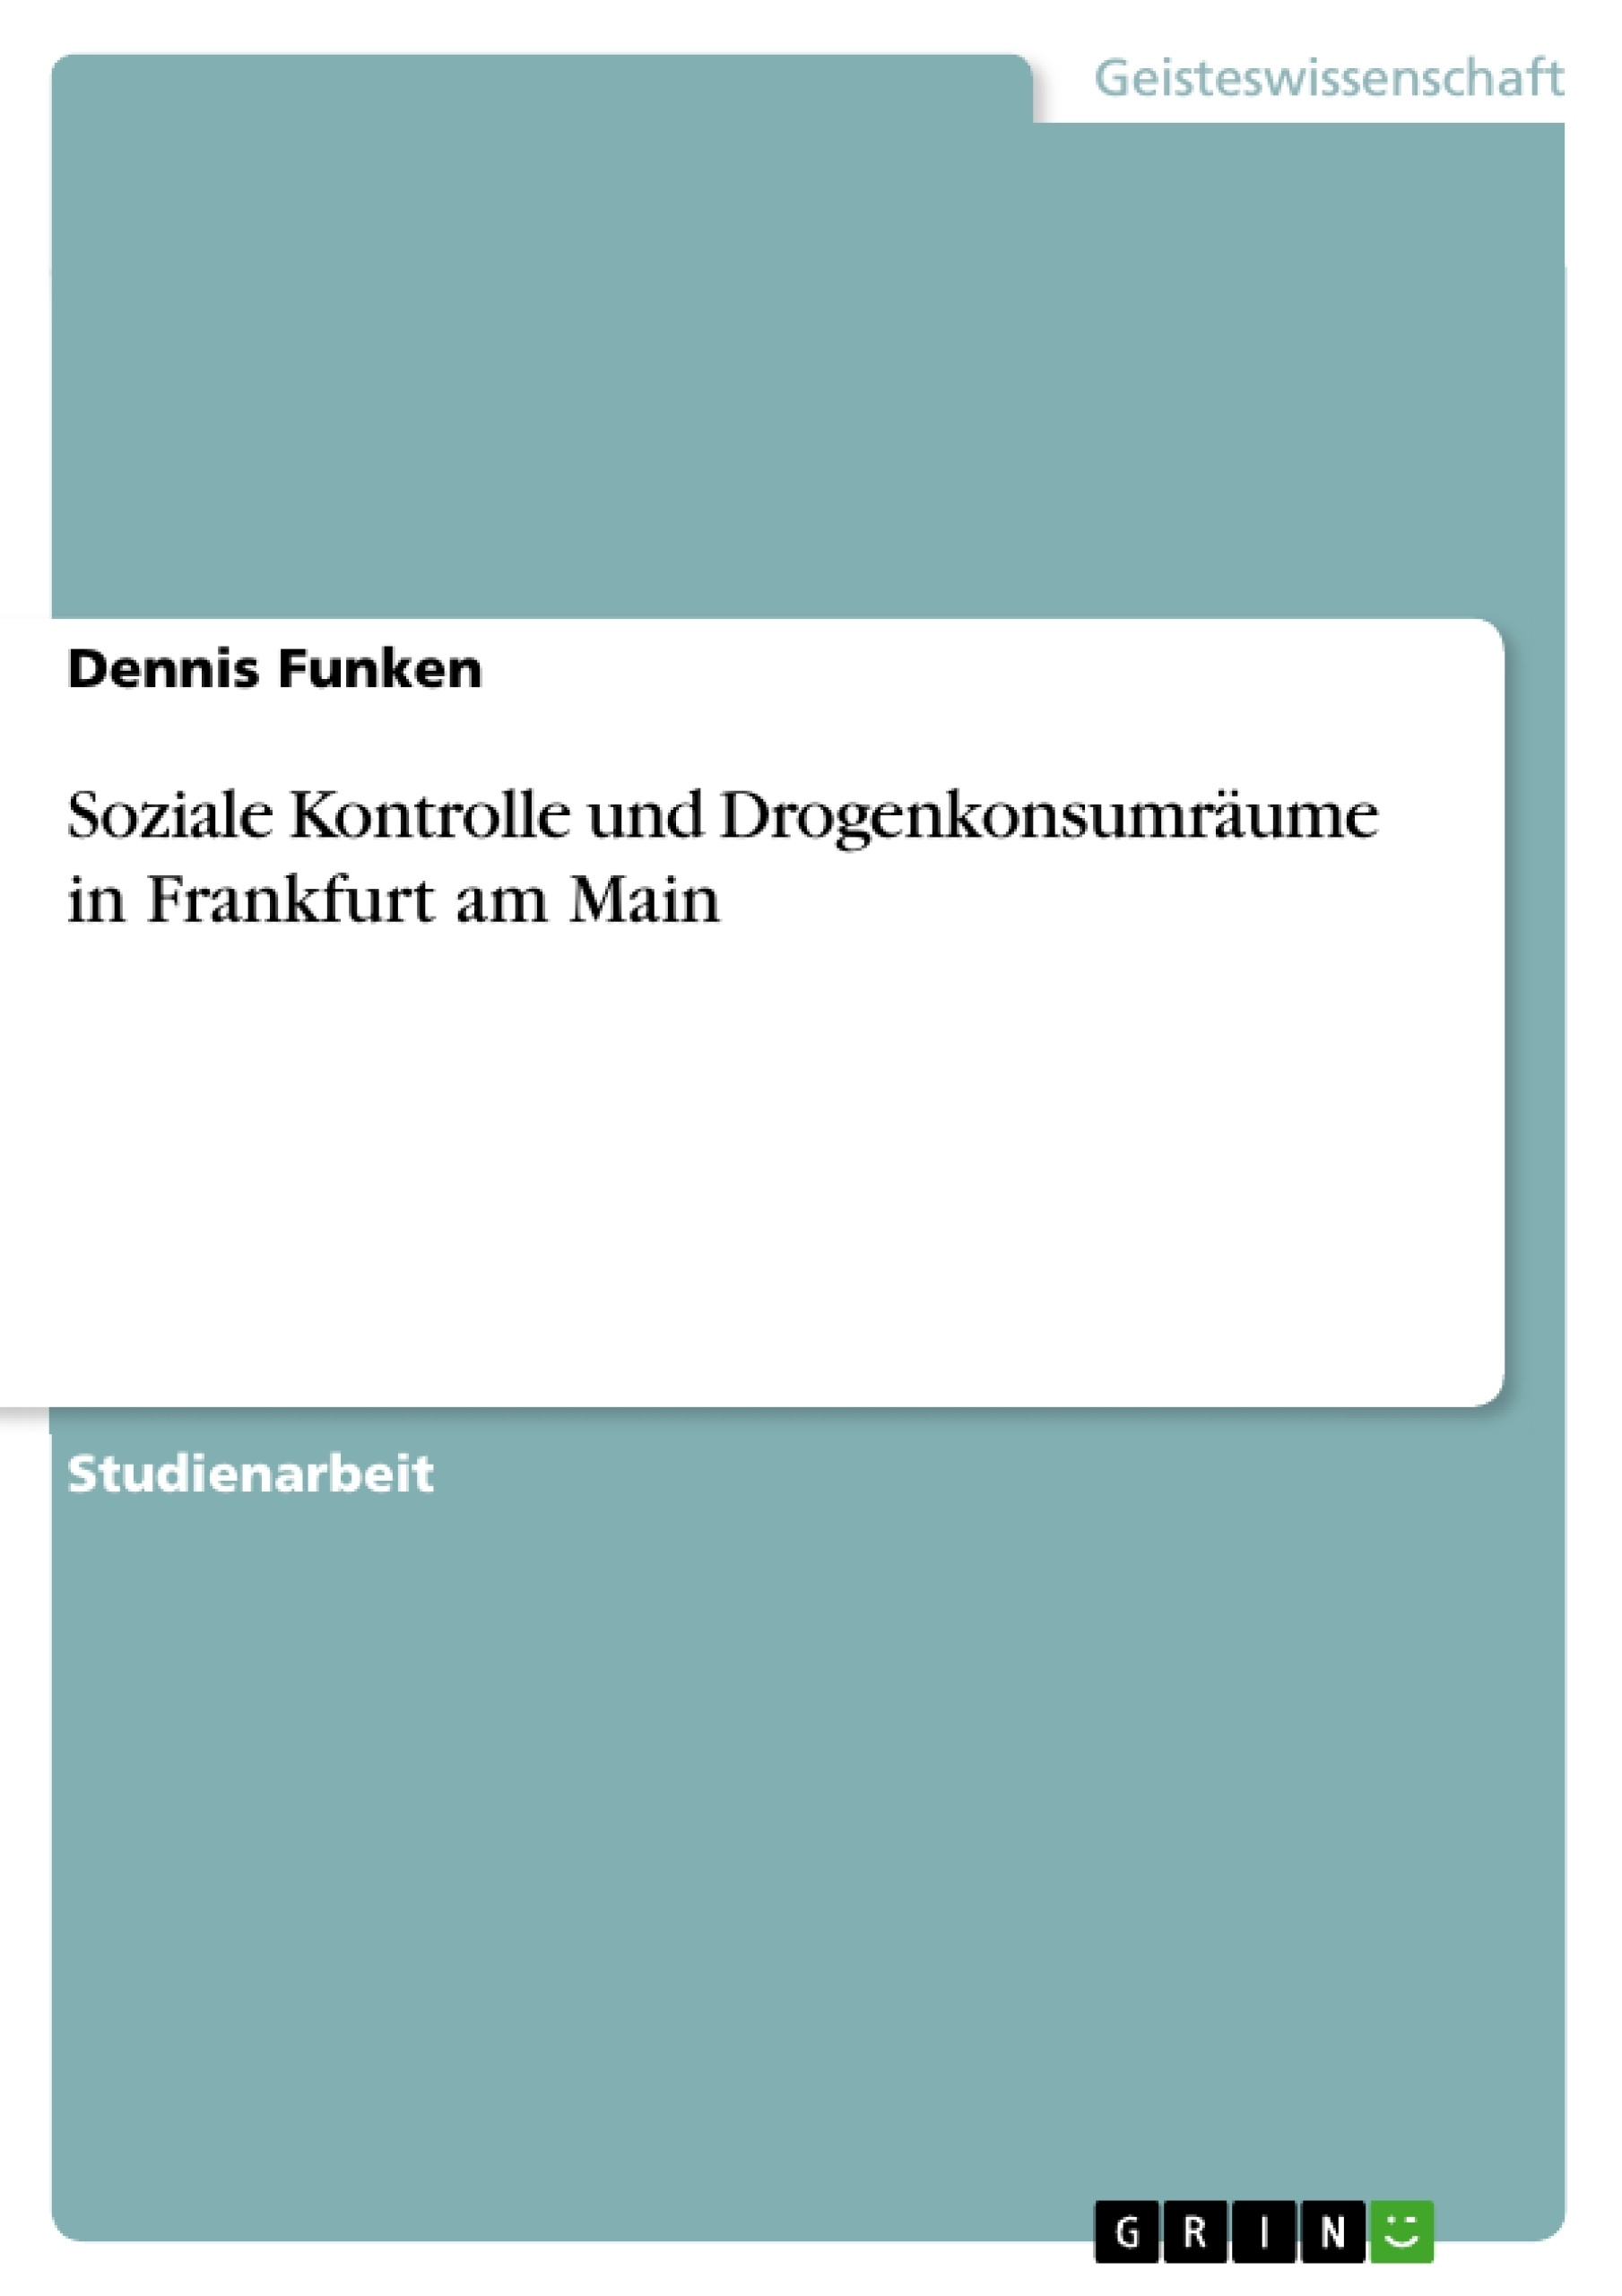 Titel: Soziale Kontrolle und Drogenkonsumräume in Frankfurt am Main